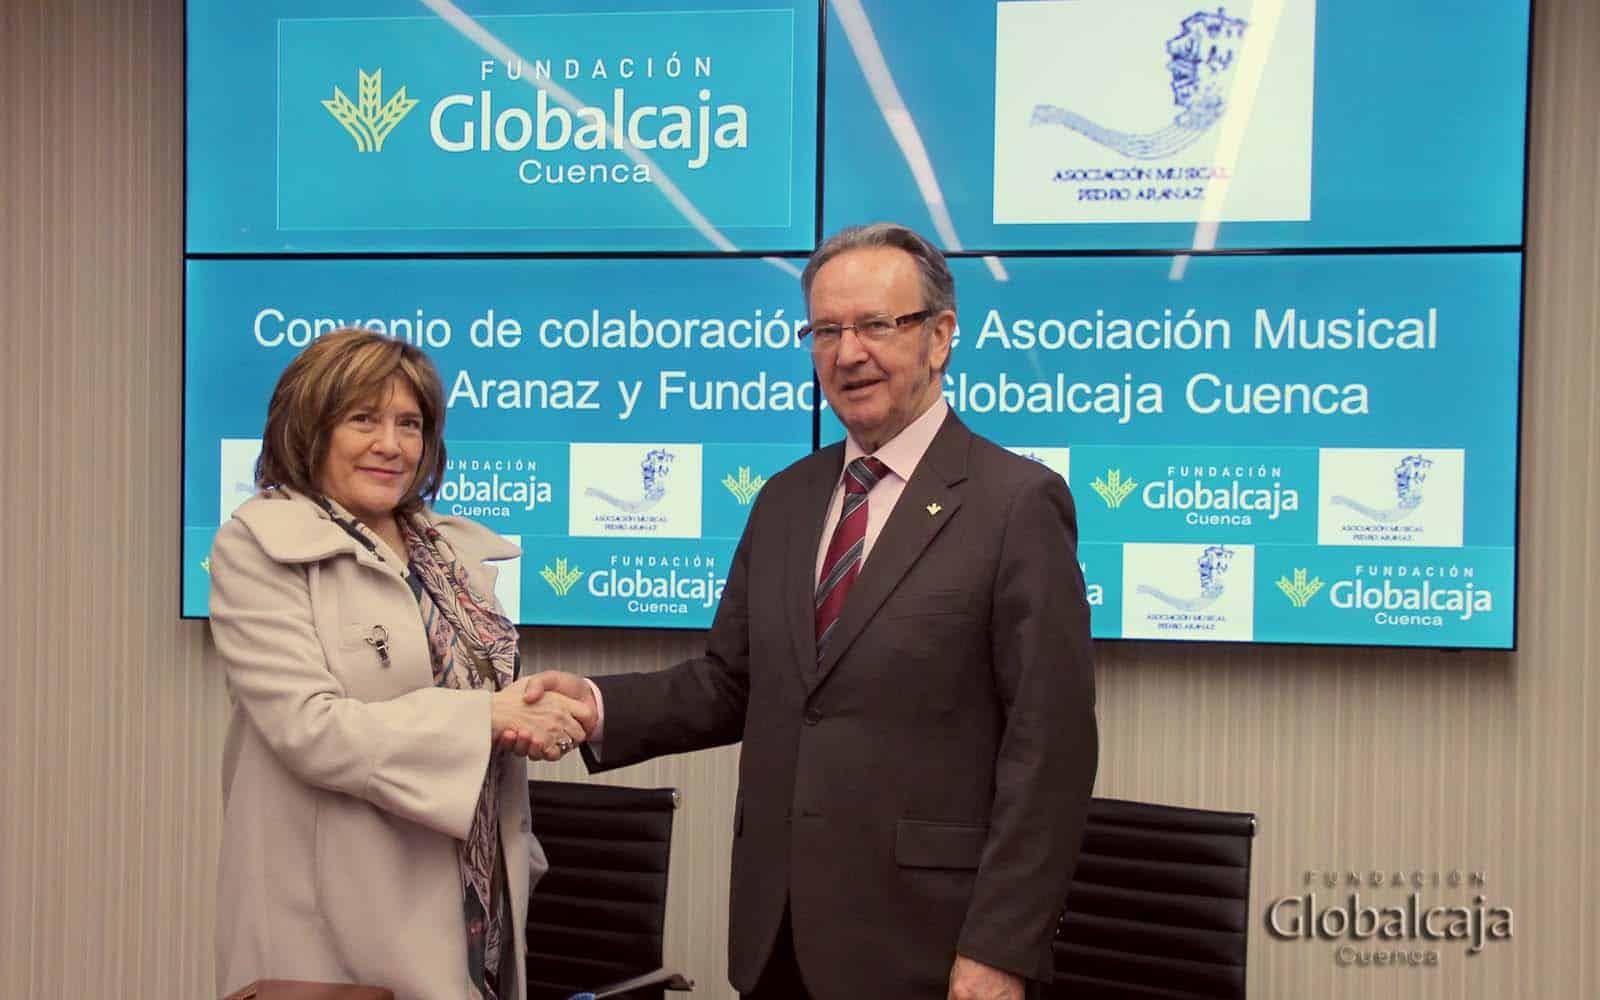 https://blog.globalcaja.es/wp-content/uploads/2017/05/FUNDACION-GLOBALCAJA-CUENCA-FIRMA-CONVENIO-Conservatorio-11_R.jpg